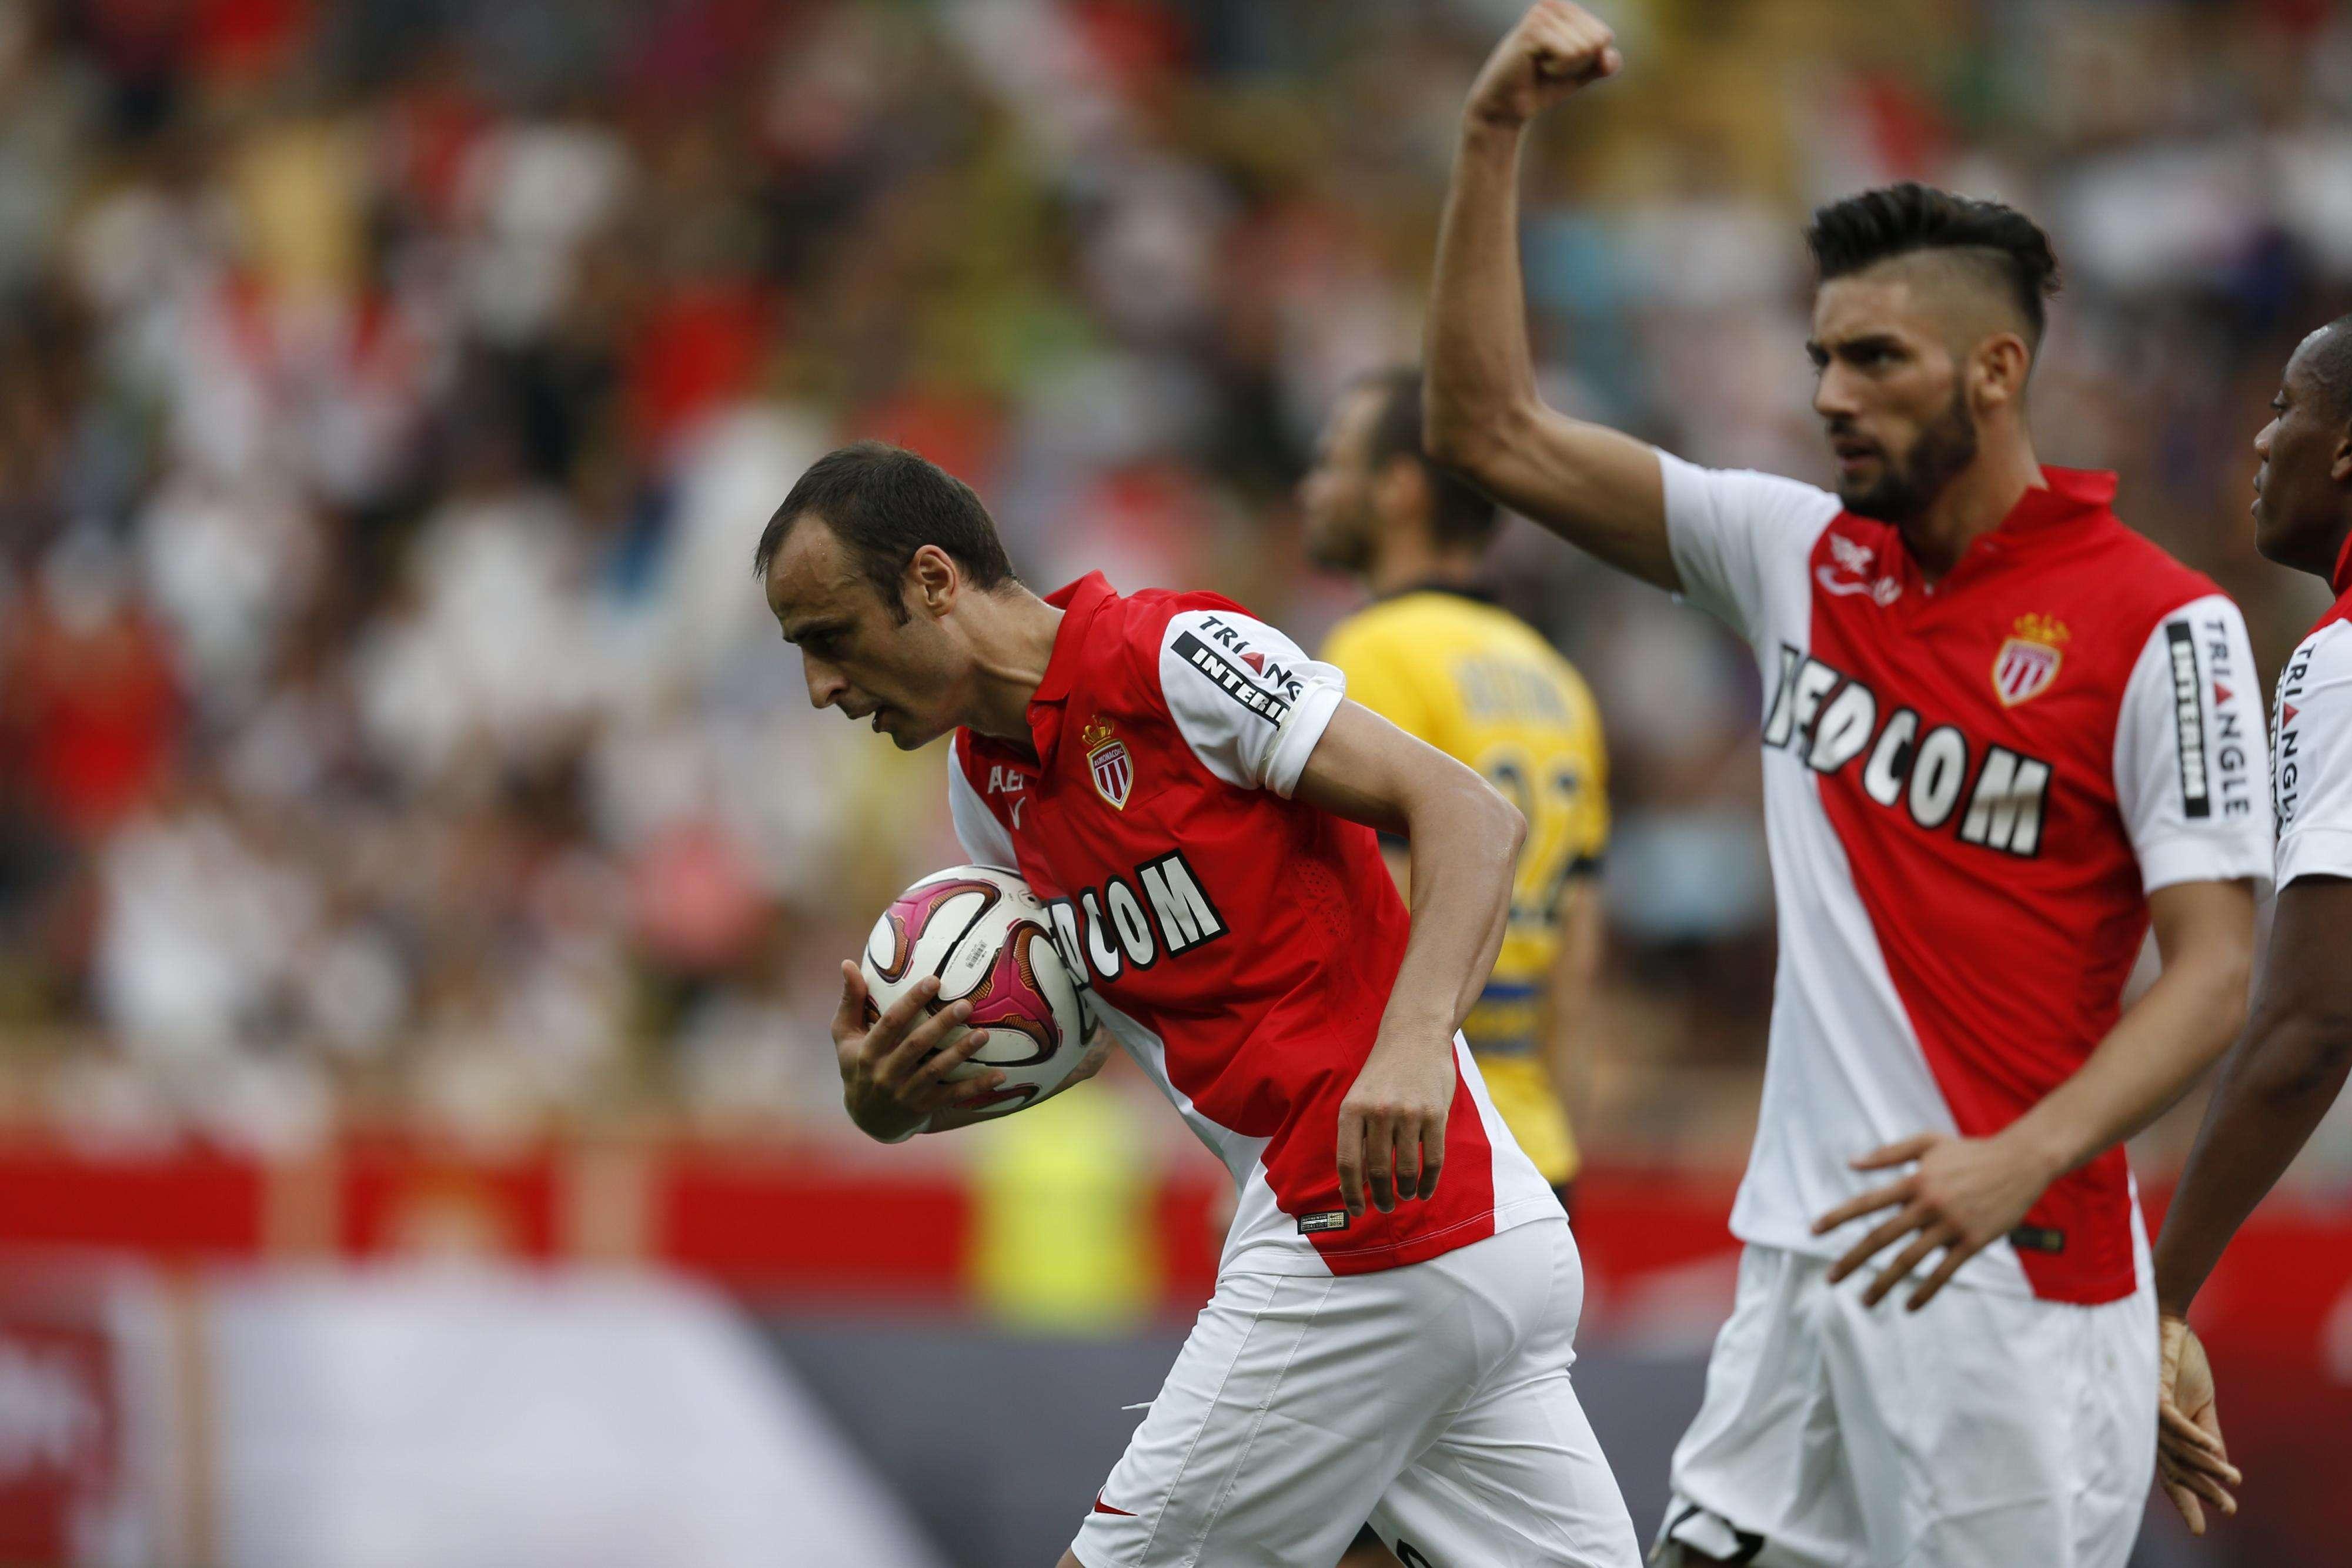 Berbatov evita derrota del Mónaco en casa, contra Lille